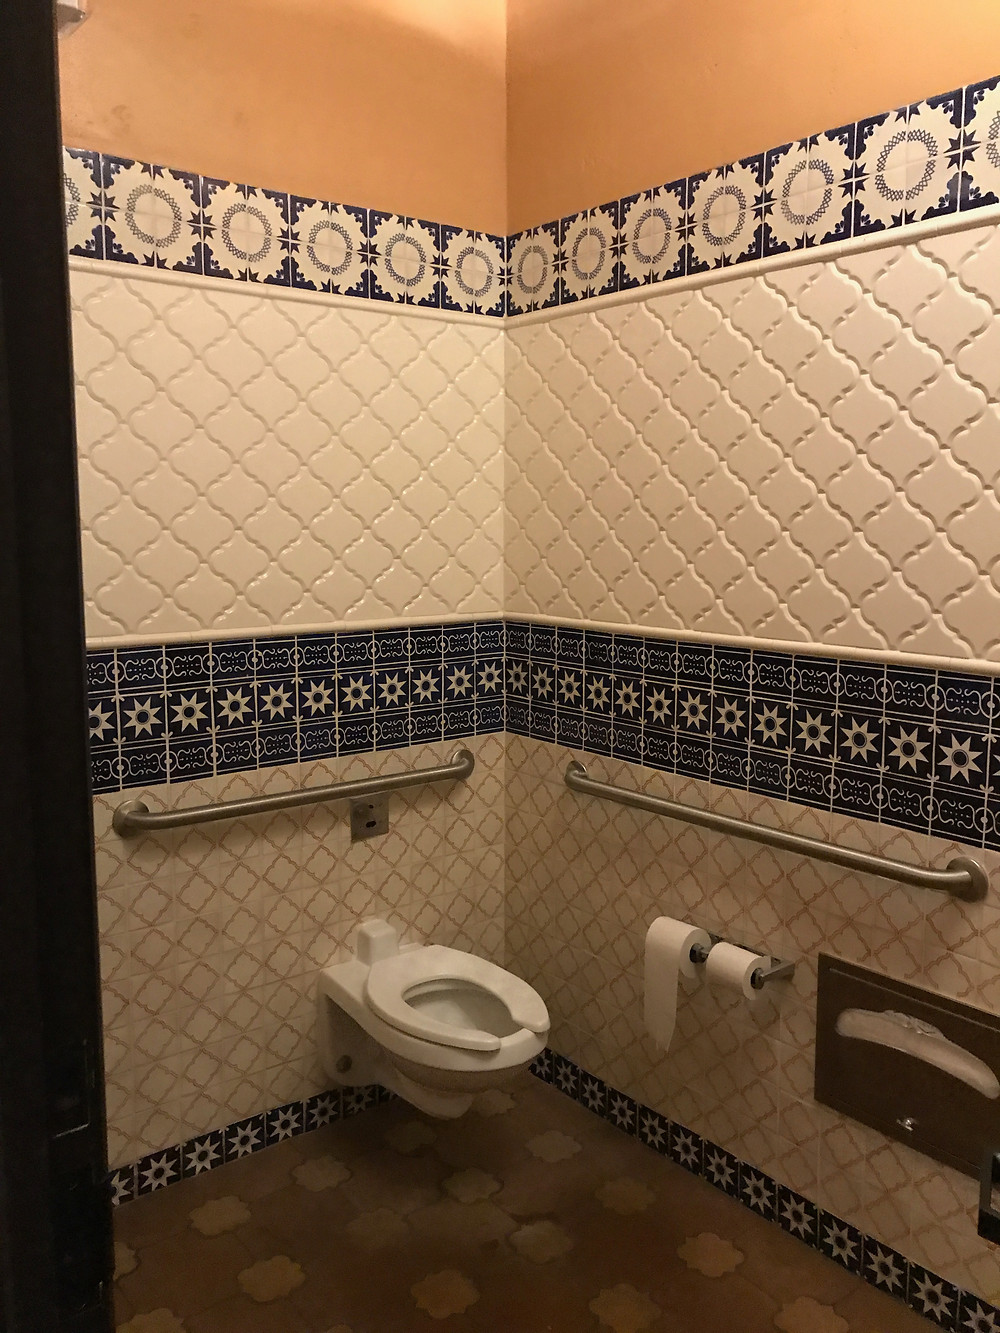 Private Loo, Skipper Canteen Bathroom